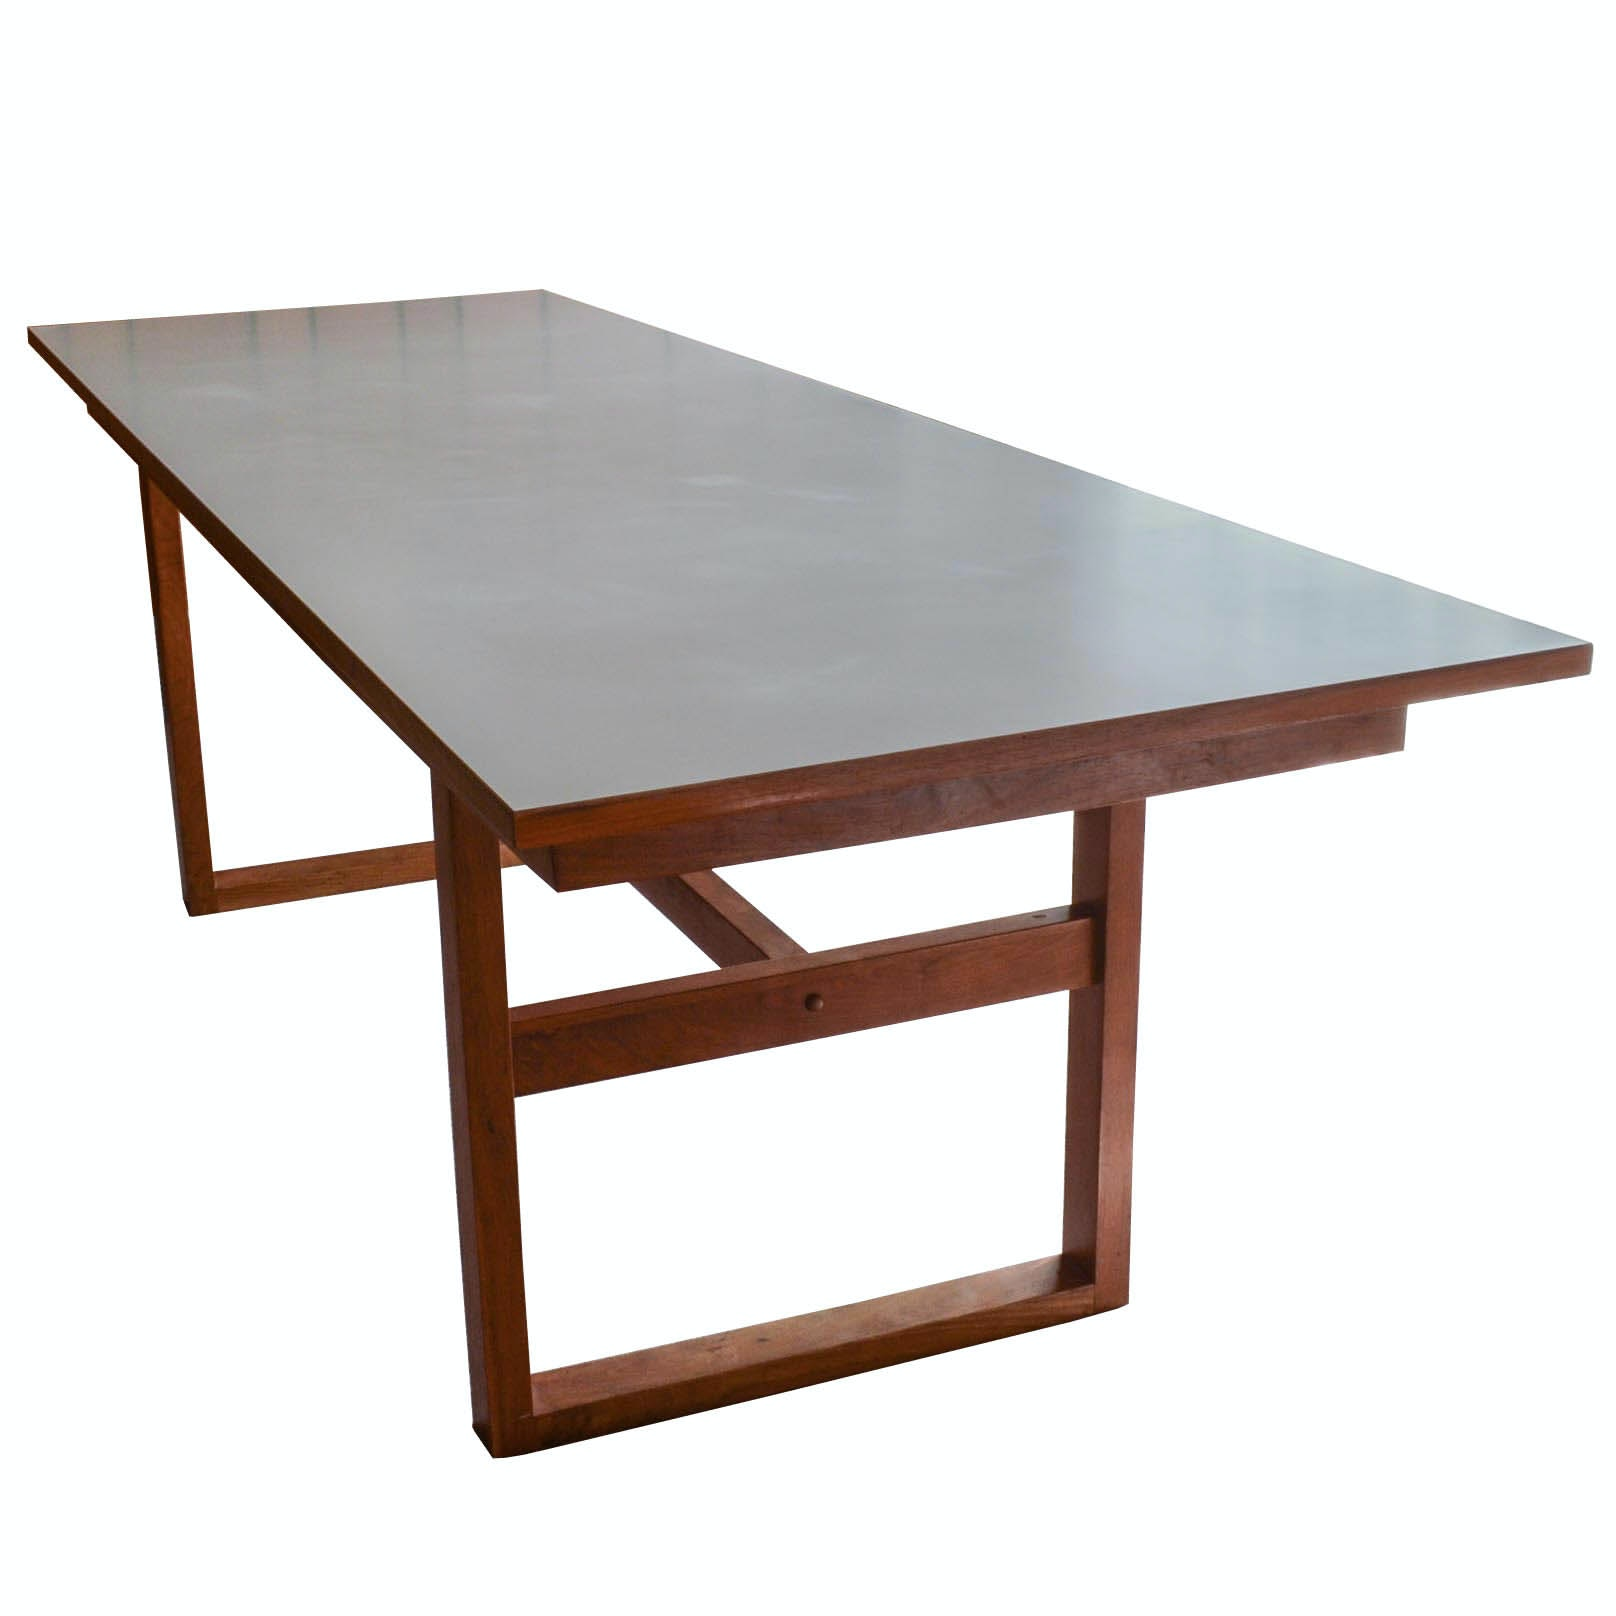 Mid Century Modern Dining Table by Otmar